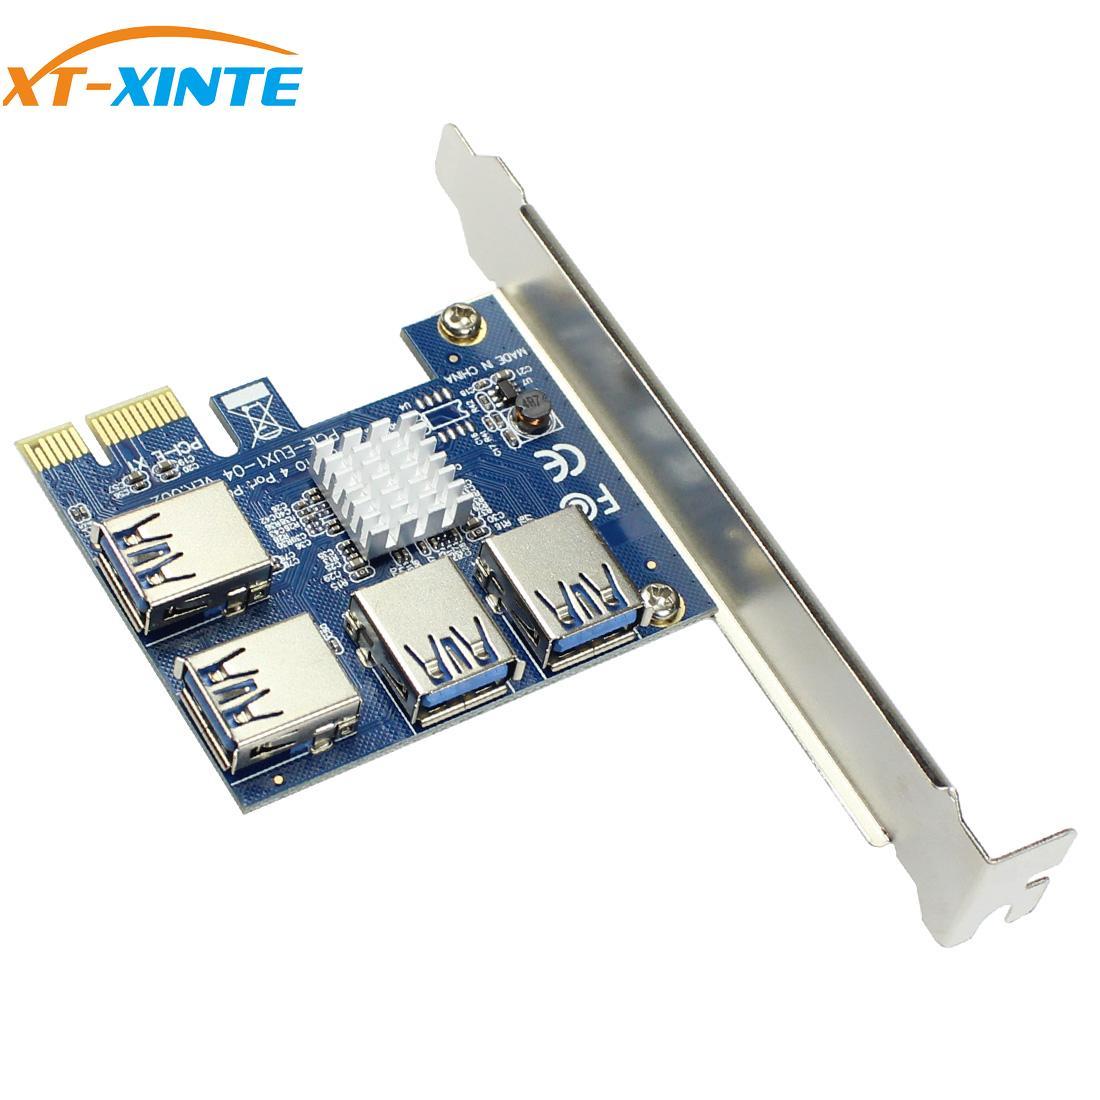 XT-XINTE PCI-E الناهض بطاقة USB بكيي ميناء المضاعف بطاقة PCI اكسبرس PCIe 1 إلى 4 PCI-E محول بطاقة ل BTC مينر آلة